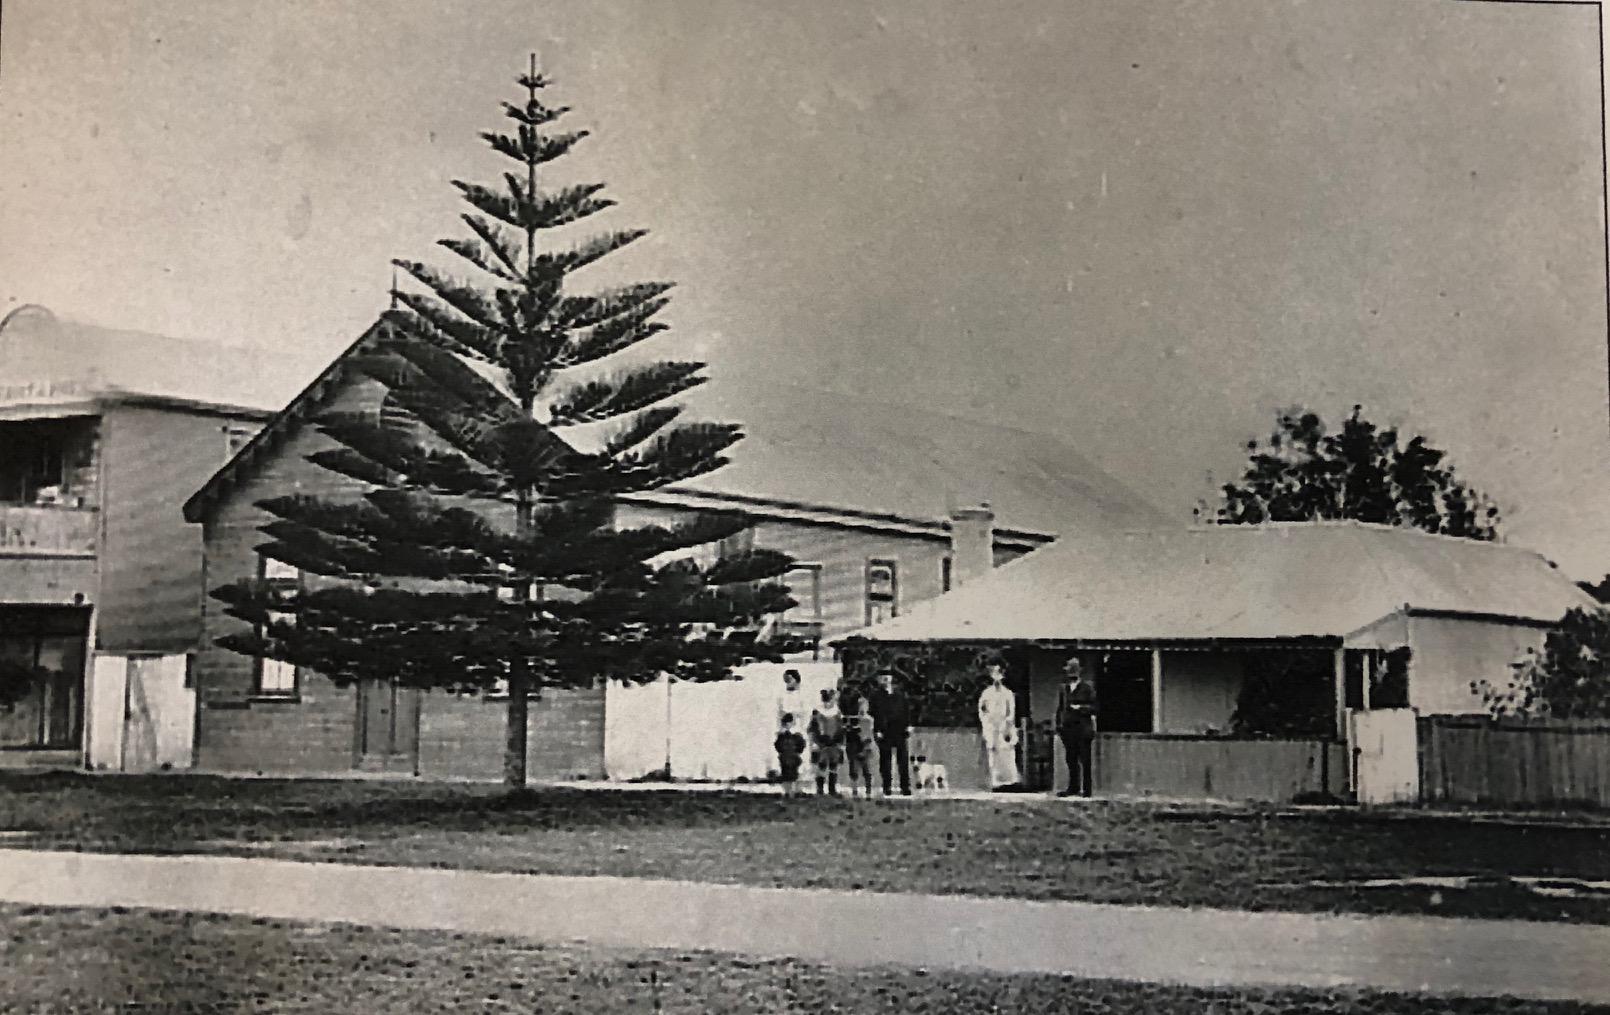 Old photo of the Bijou Theatre